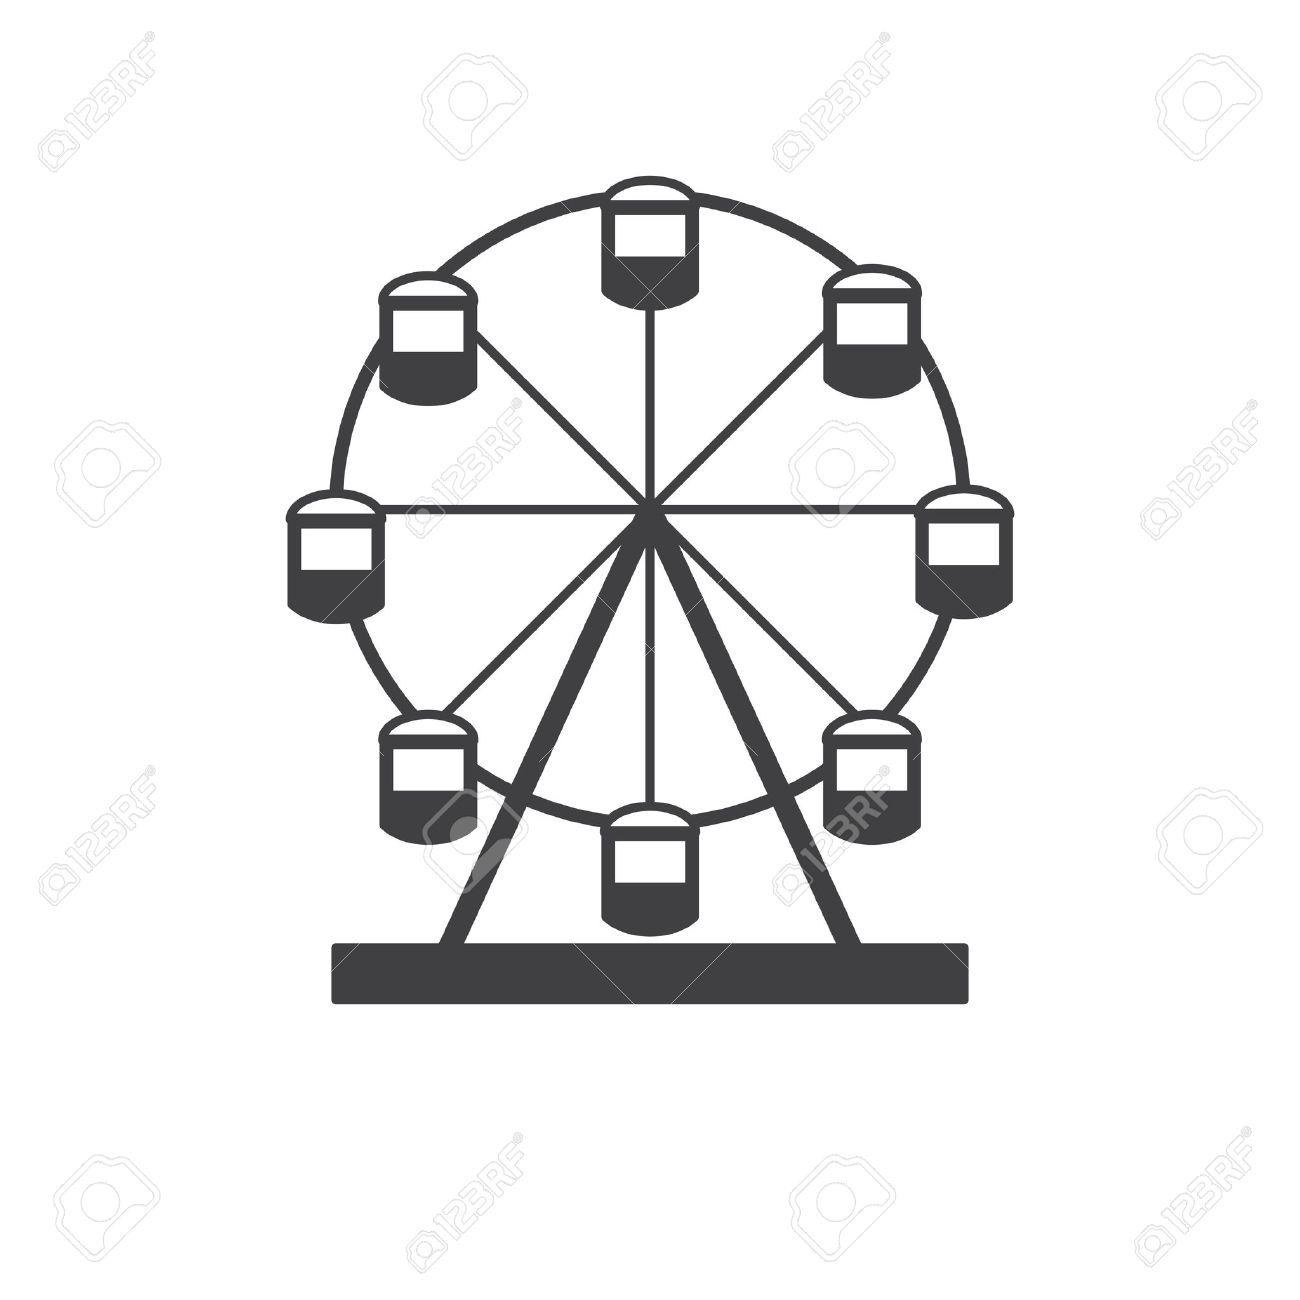 Ferris Wheel Silhouette Of A Ferris Wheel Icon Ferris Wheel Isolated On White Background Royalty Free Cliparts Vetores E Ilustracoes Stock Image 56300970